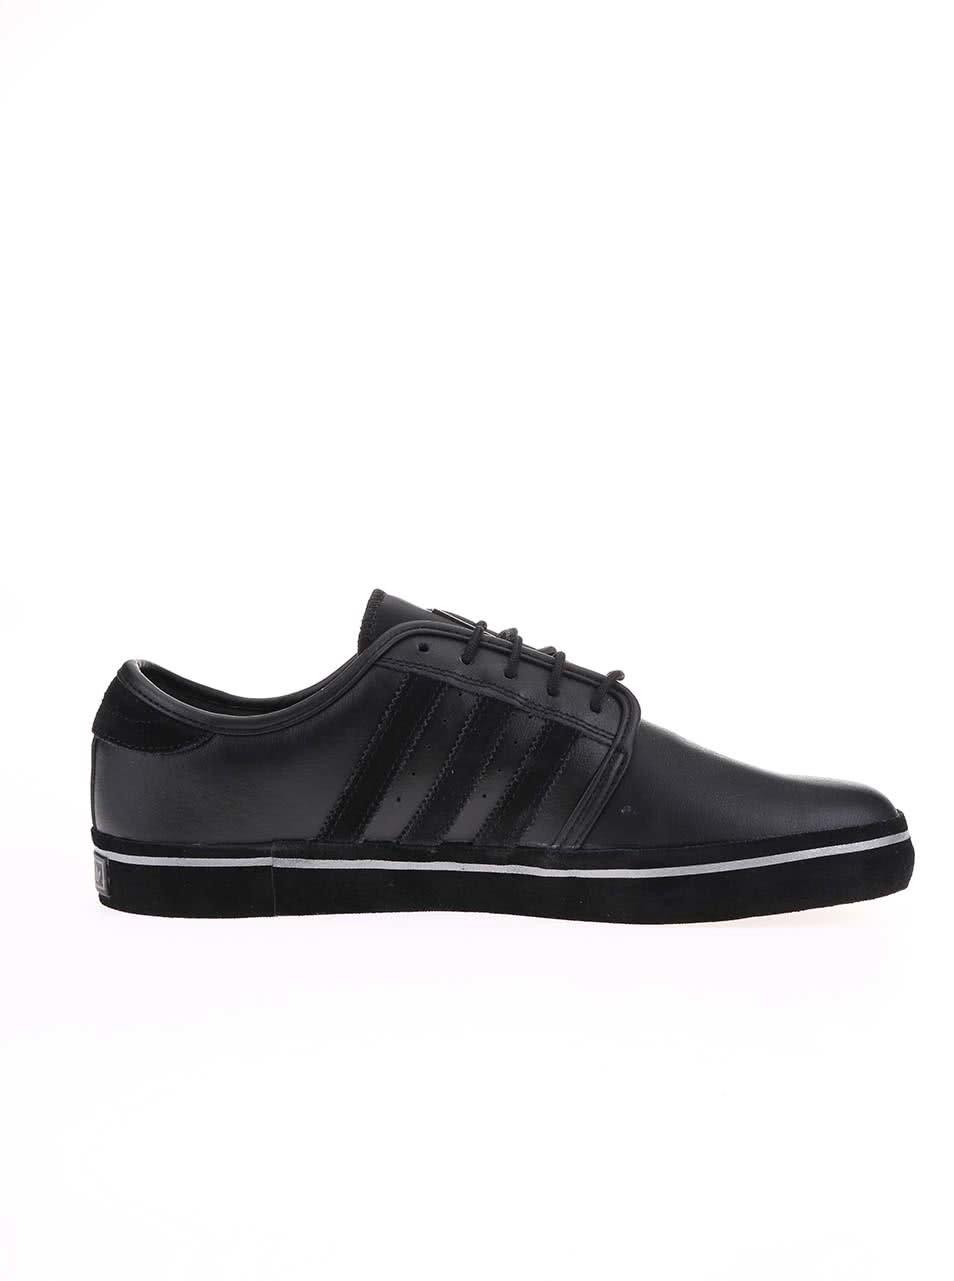 0e7be7131 Černé pánské kožené tenisky adidas Originals Seeley | ZOOT.cz